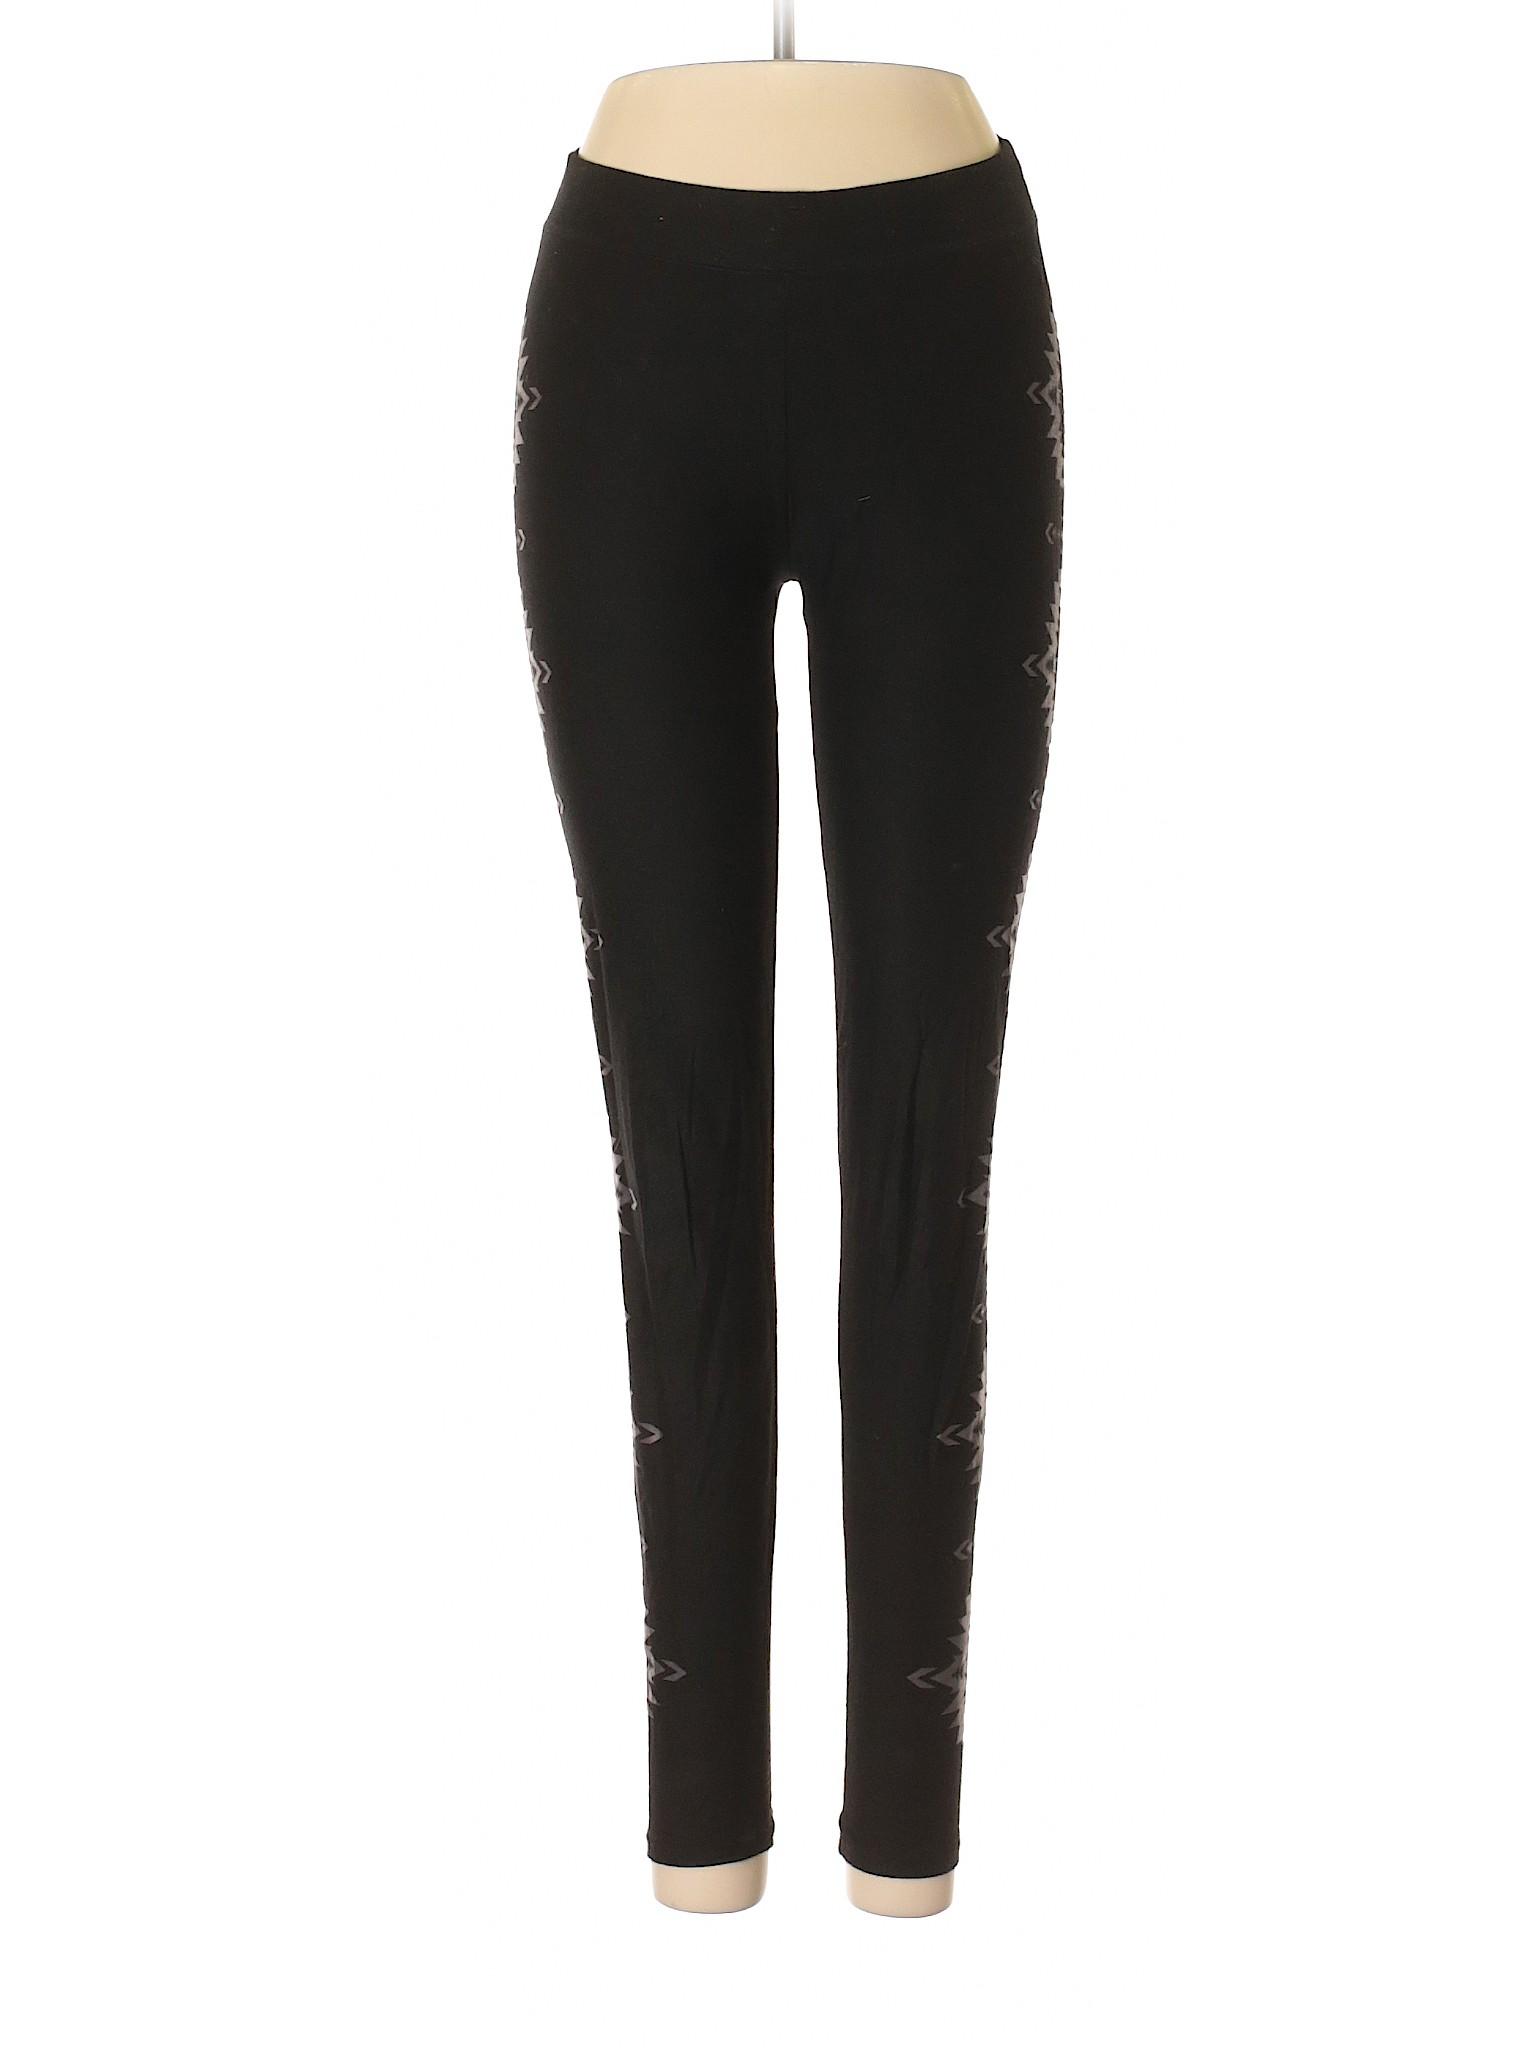 Leisure Victoria's winter Leggings Secret Pink r4rq5